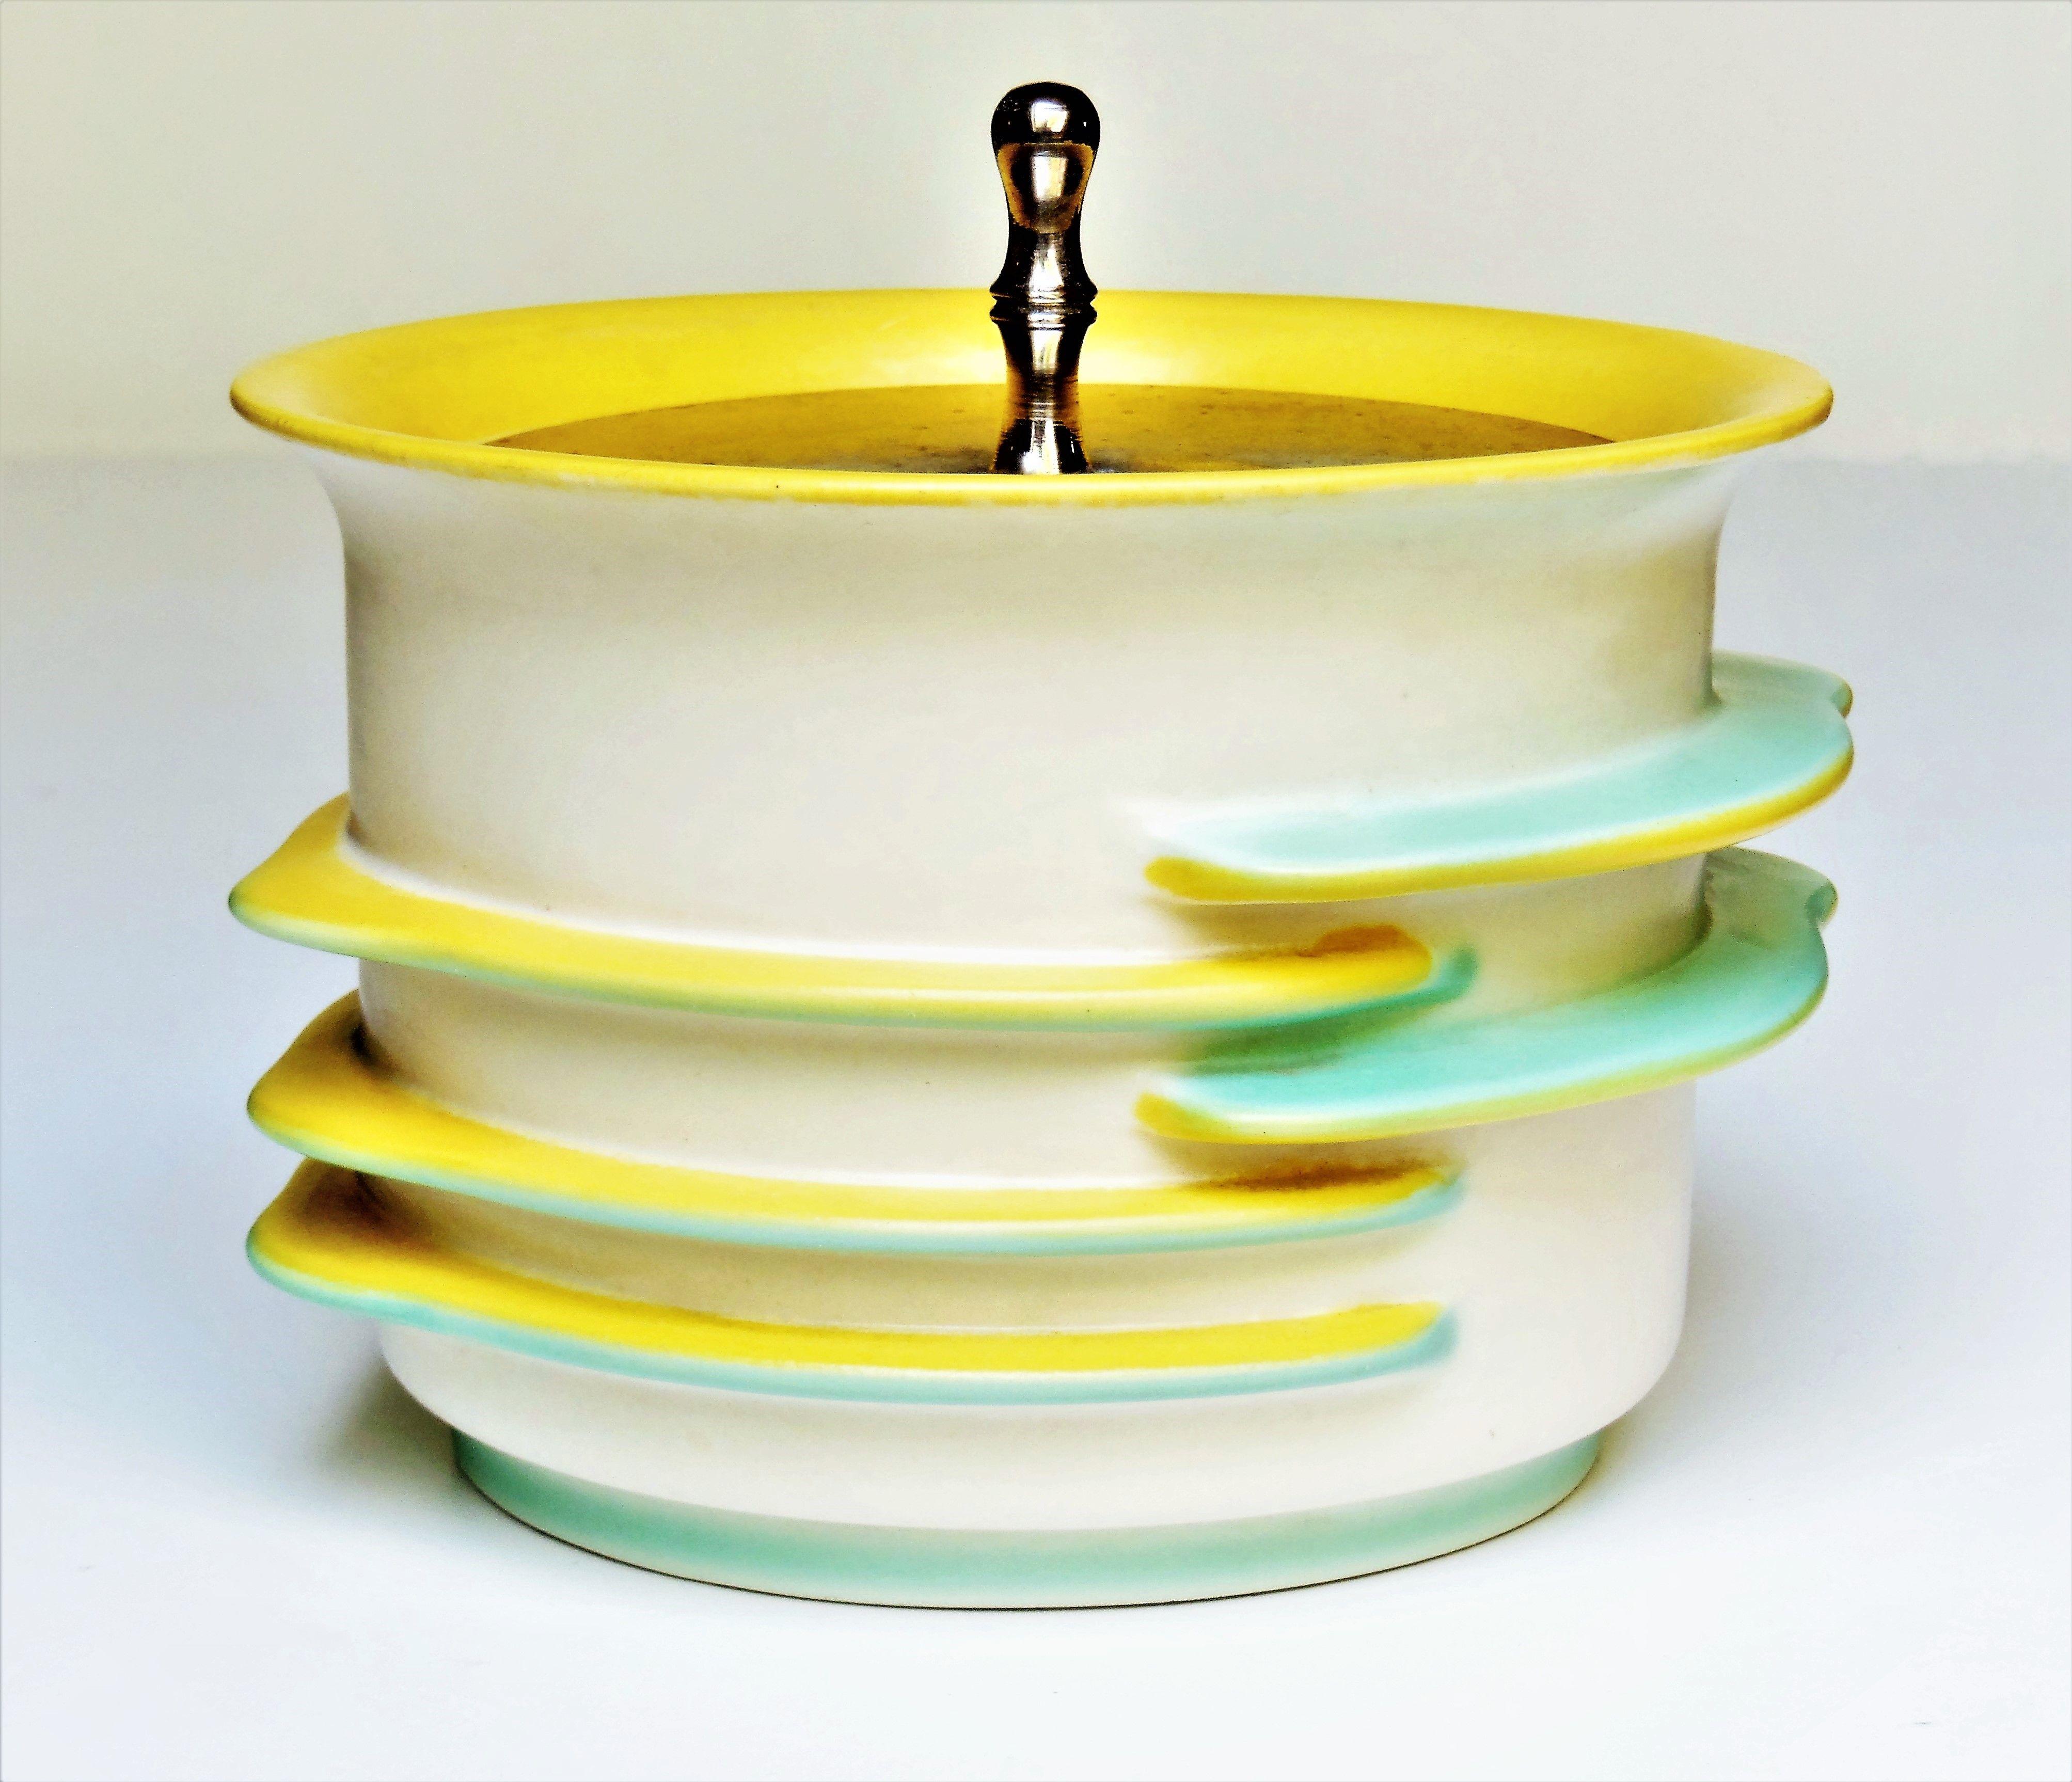 Ceramic can * MARGARETE HEYMANN * HAEL 1930 Sterne